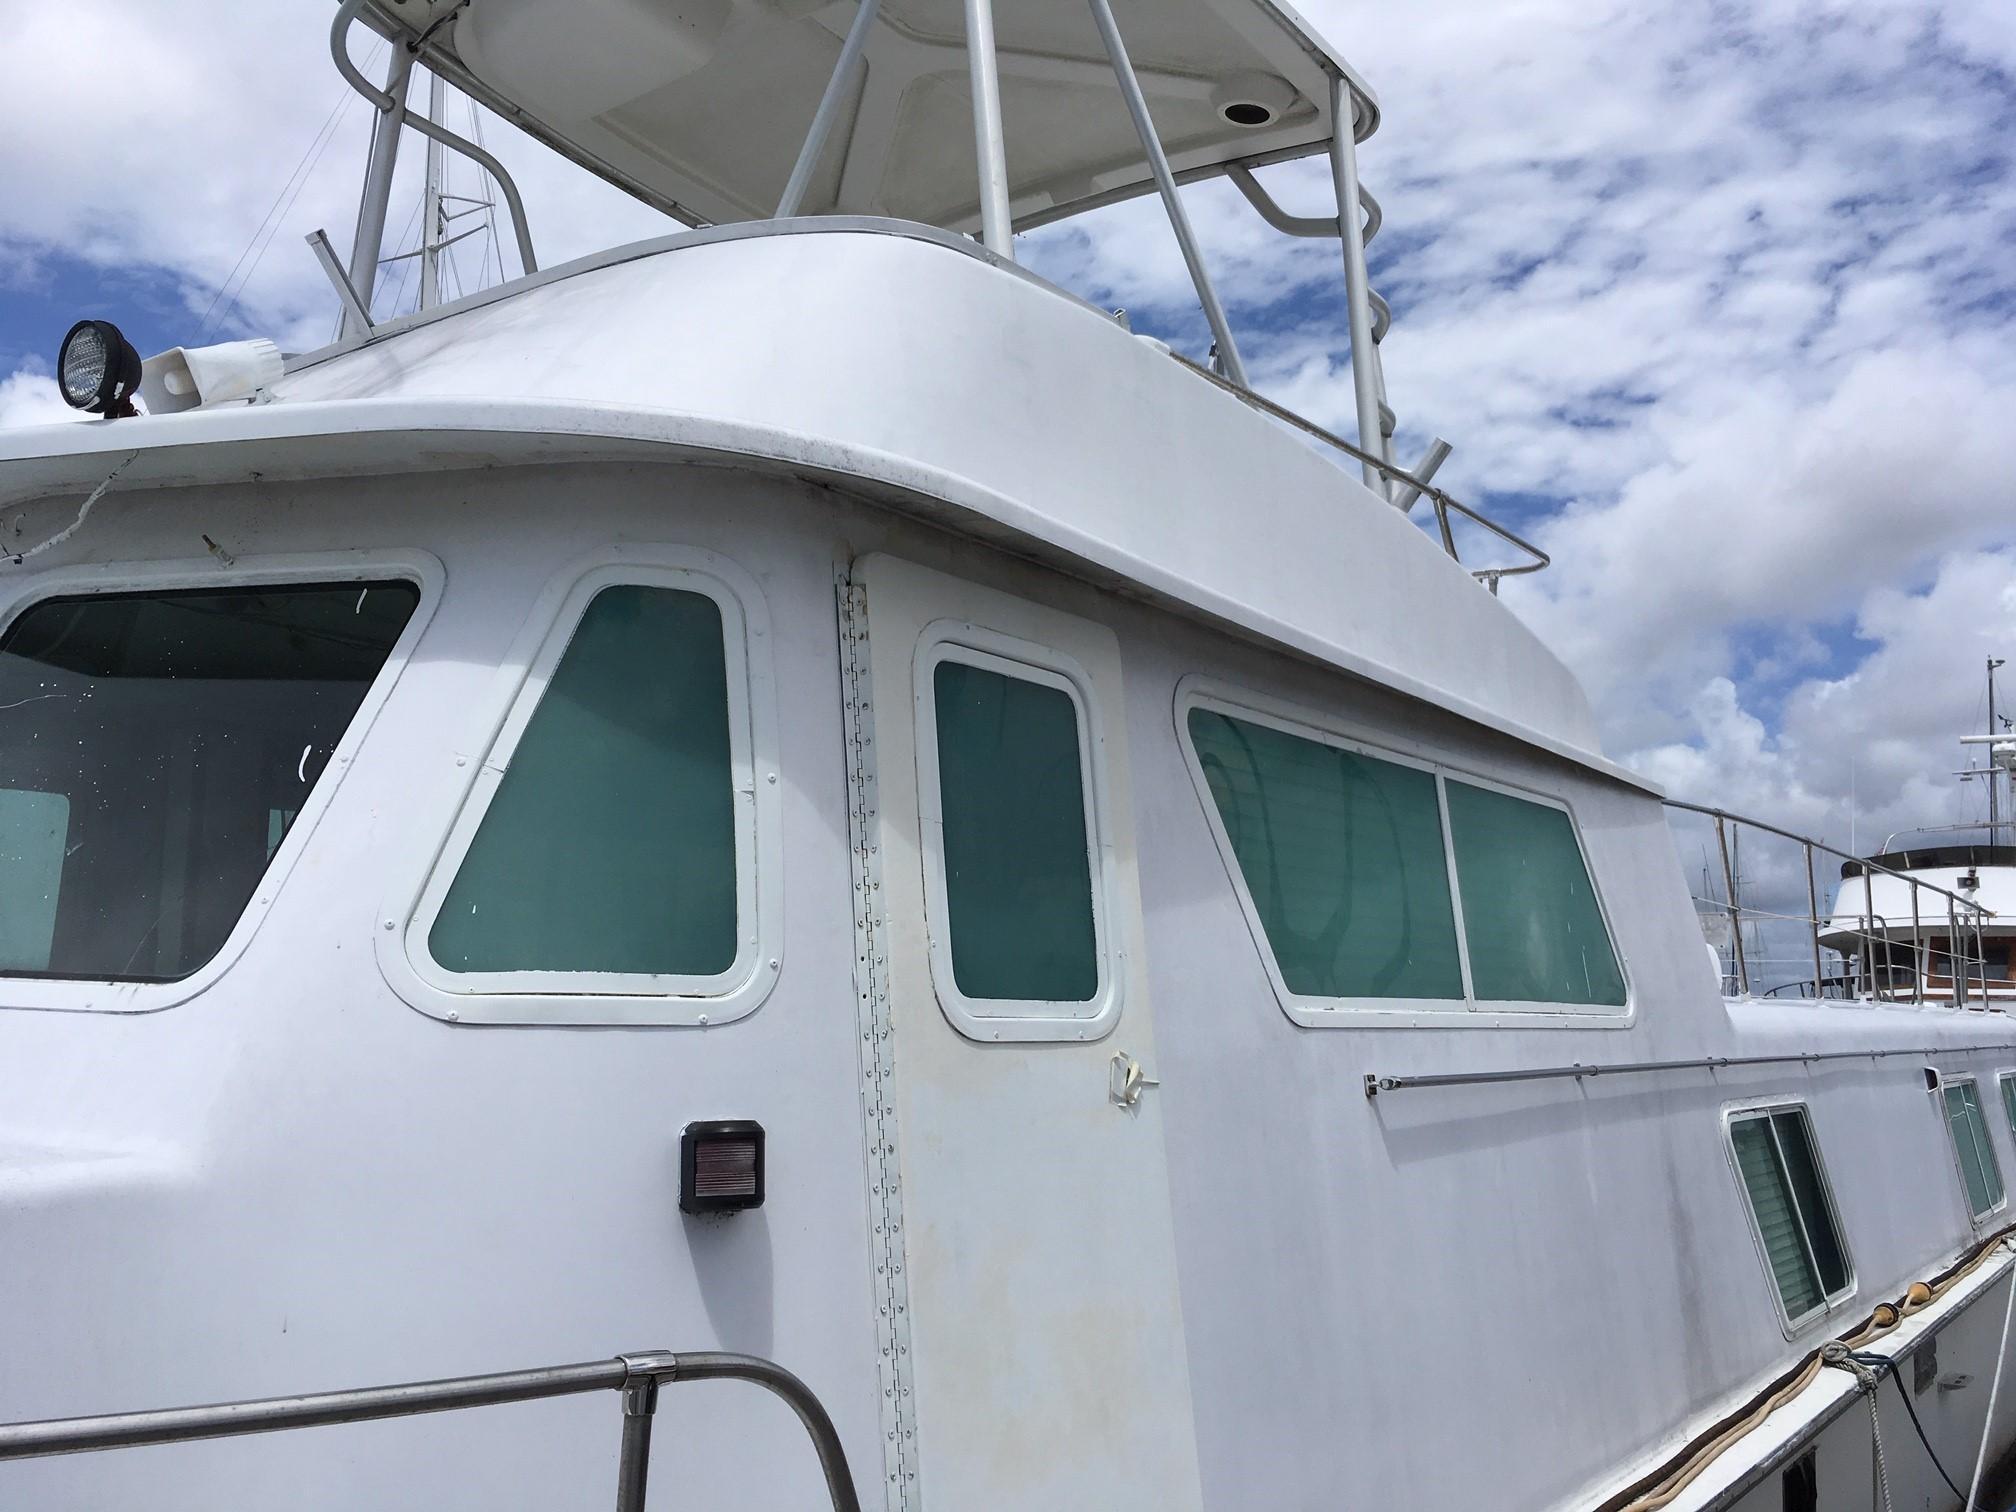 Carri-craft 57-ft Power Catamaran - port